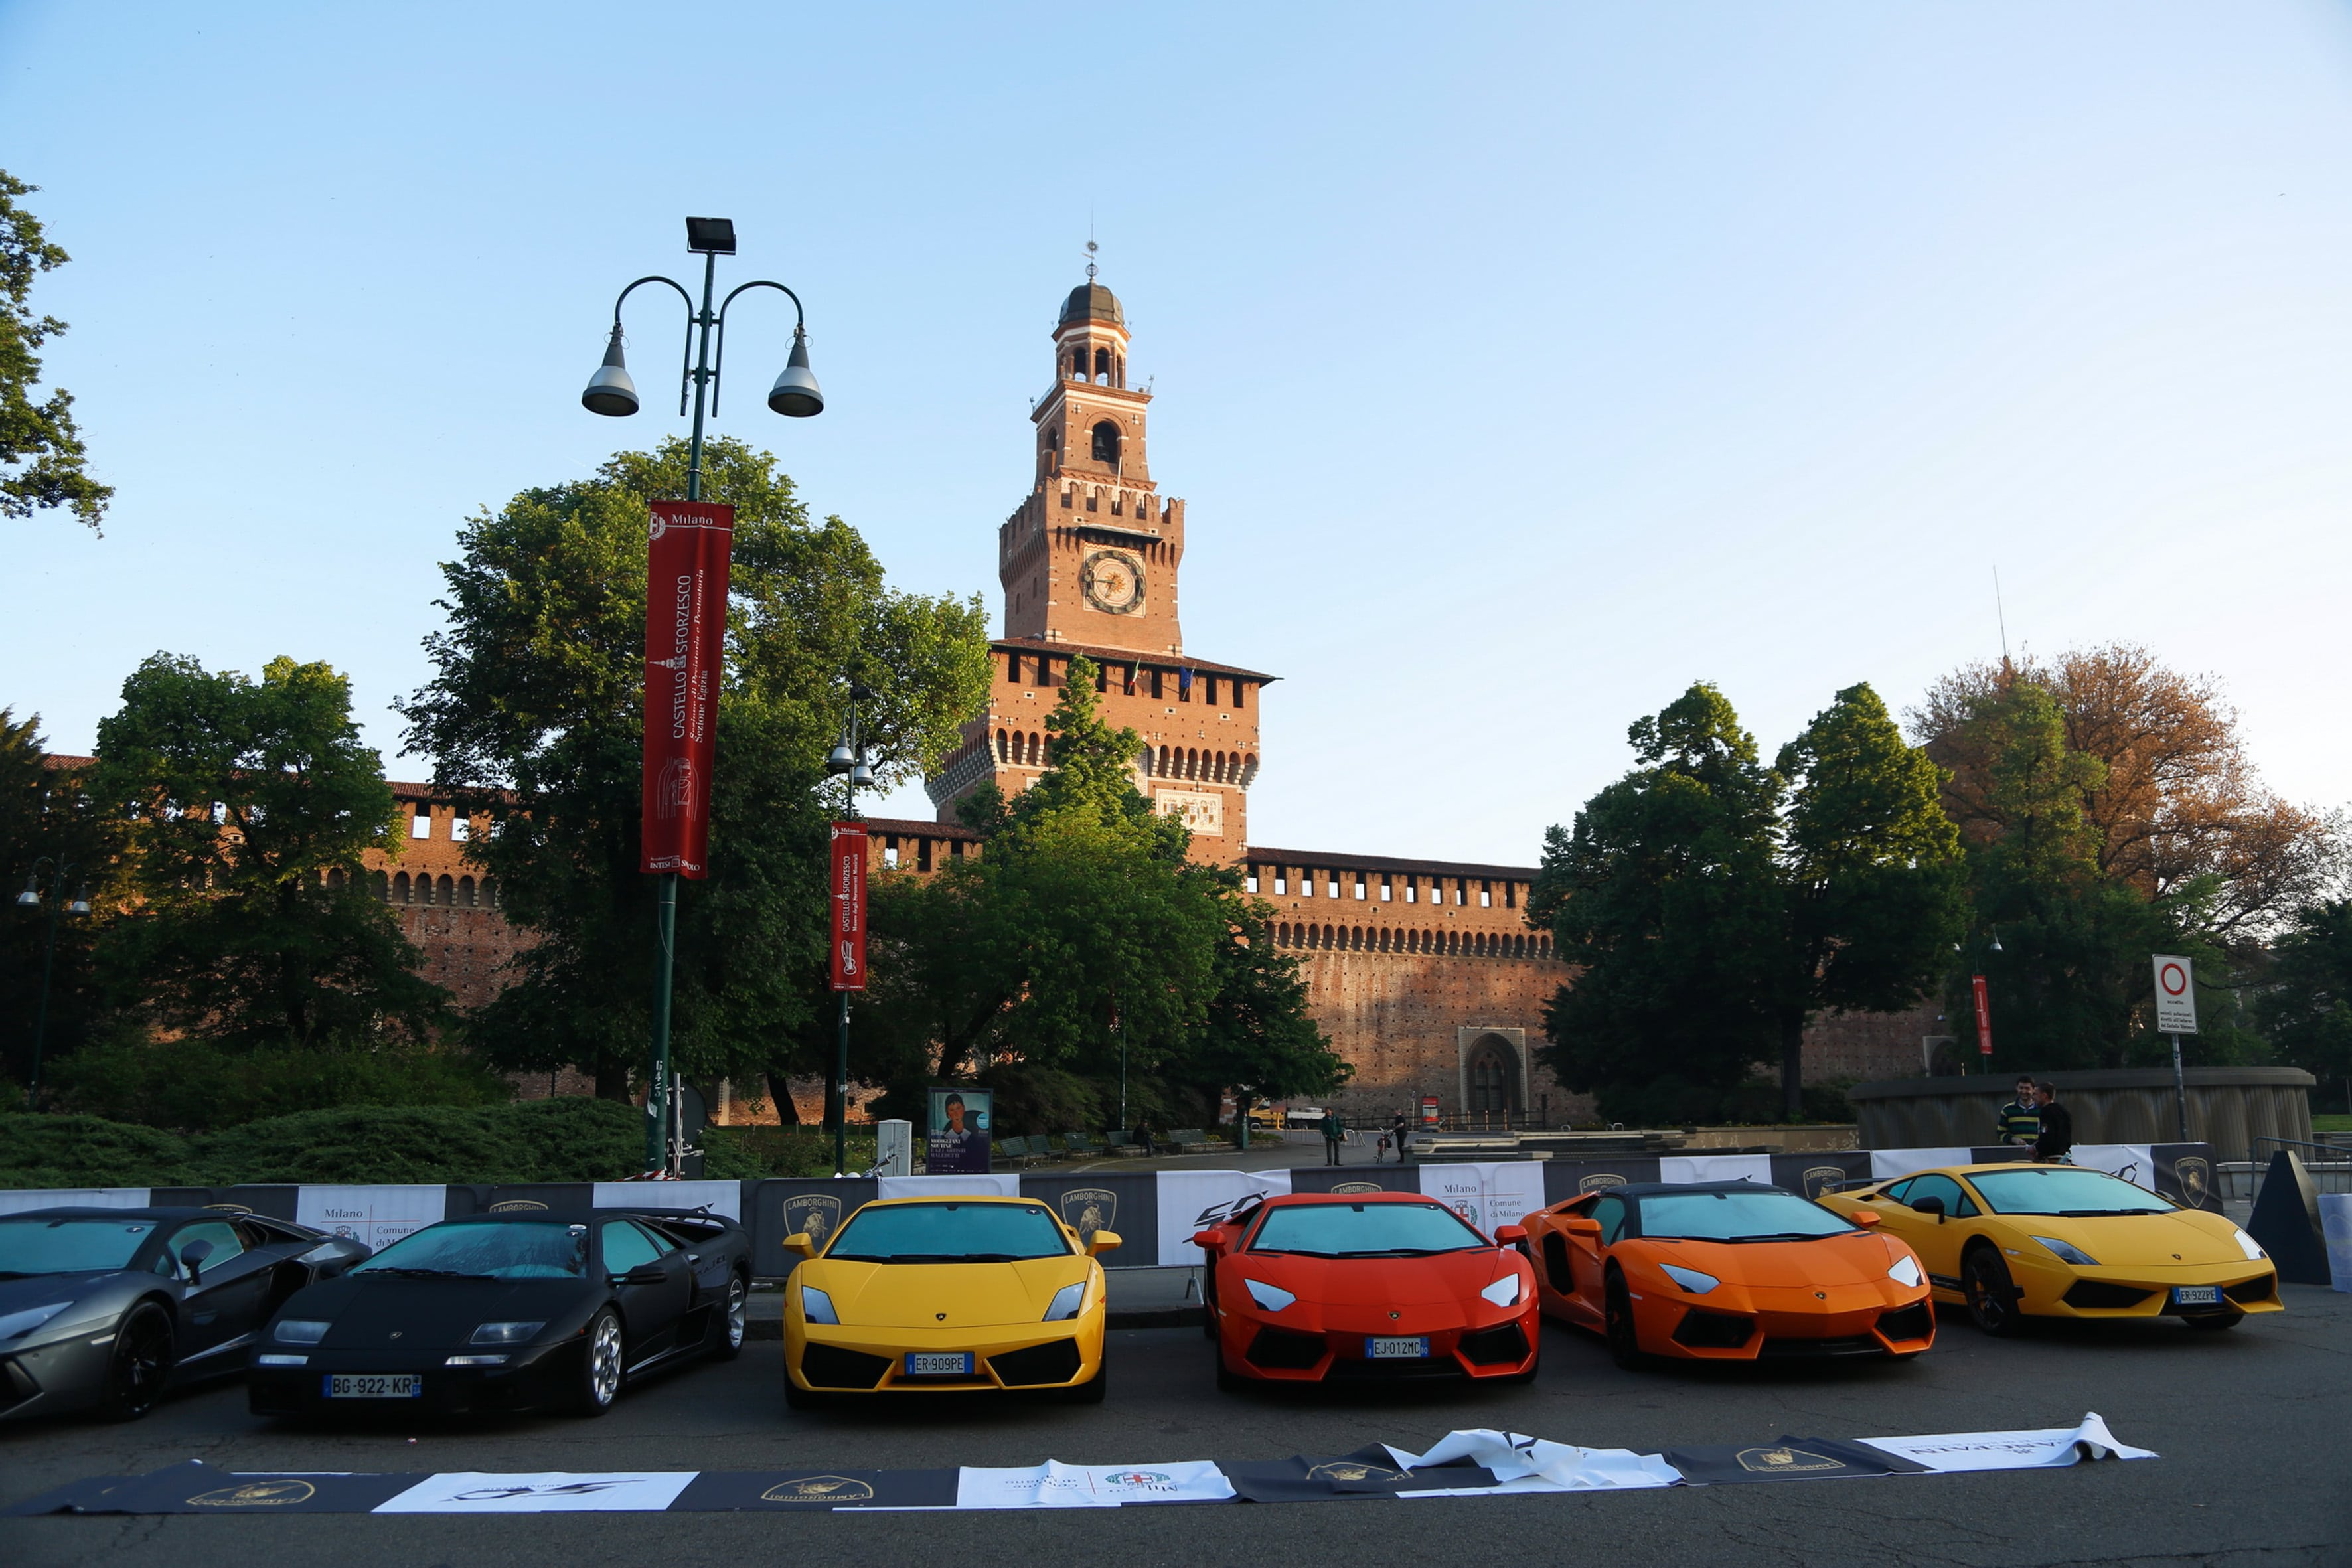 Lamborghini 50th Anniversary Grand Tour Begins – 350 Lambos Celebrating   CarNewsCafe.comCarNewsCafe.com